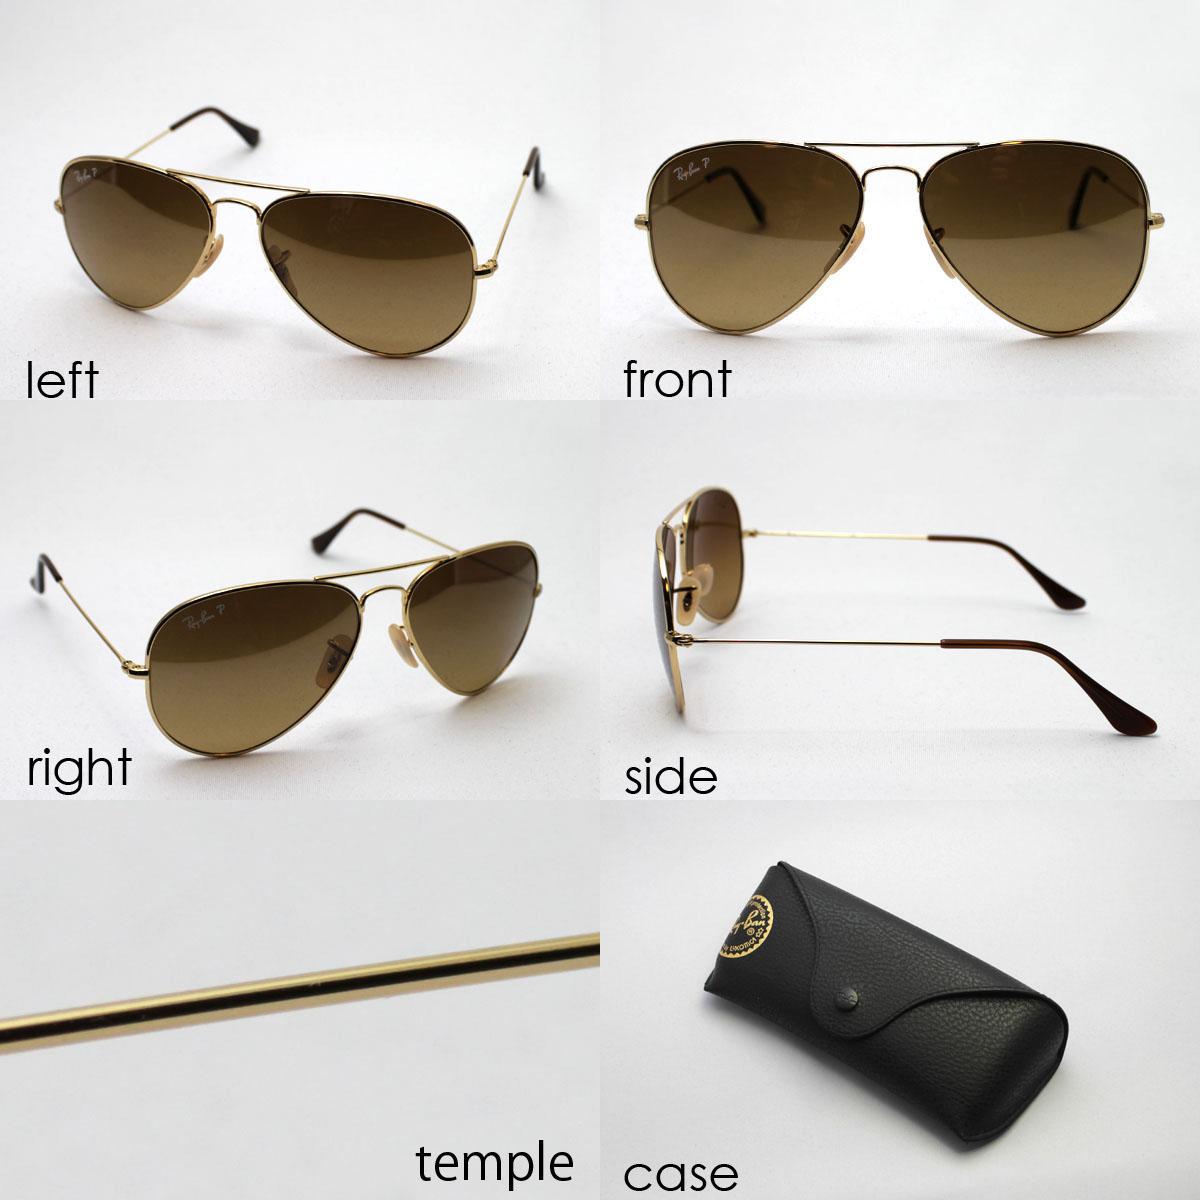 c36795774ea RB8041 001M2 RayBan Ray Ban sunglasses polarized AVIATOR TITANIUM  glassmania tear drop